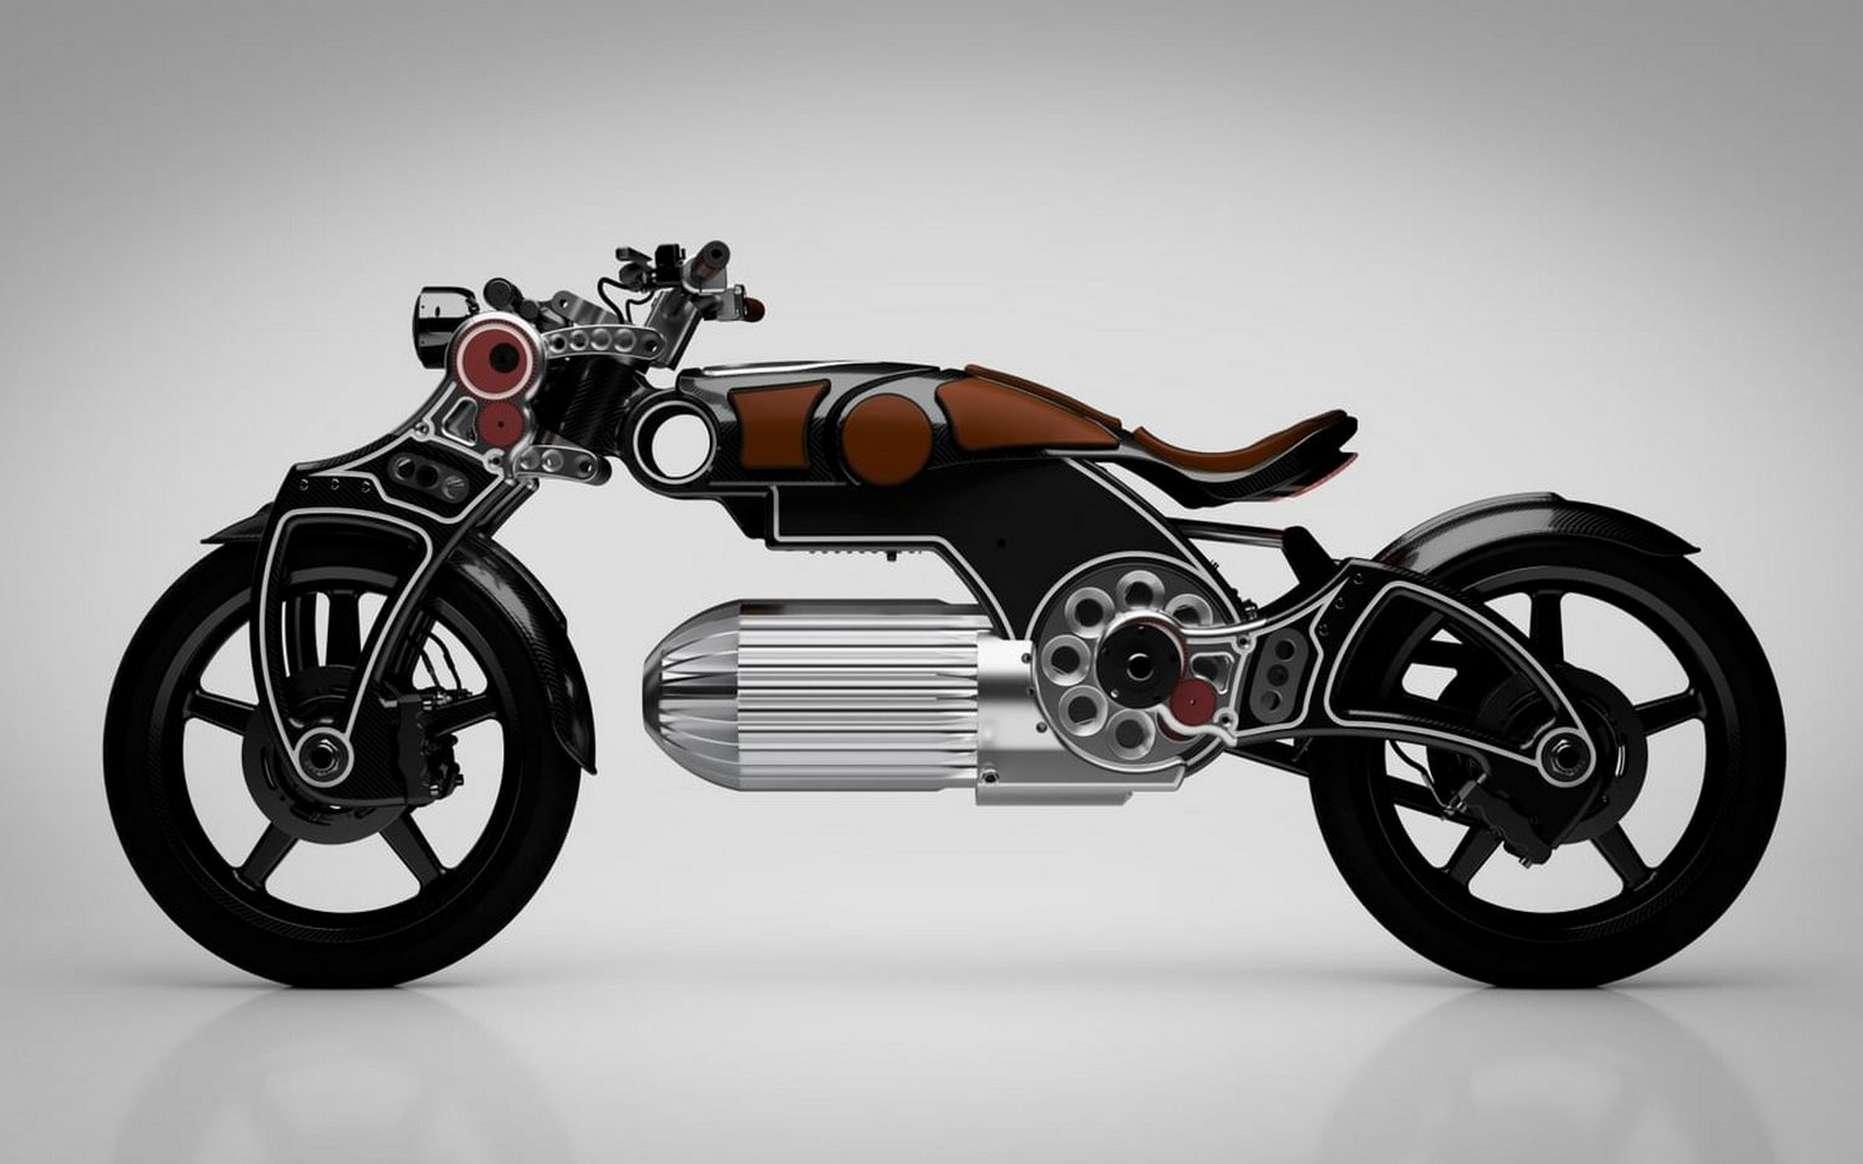 La moto électrique Hades de Curtiss Motorcycles. © Curtiss Motorcycles